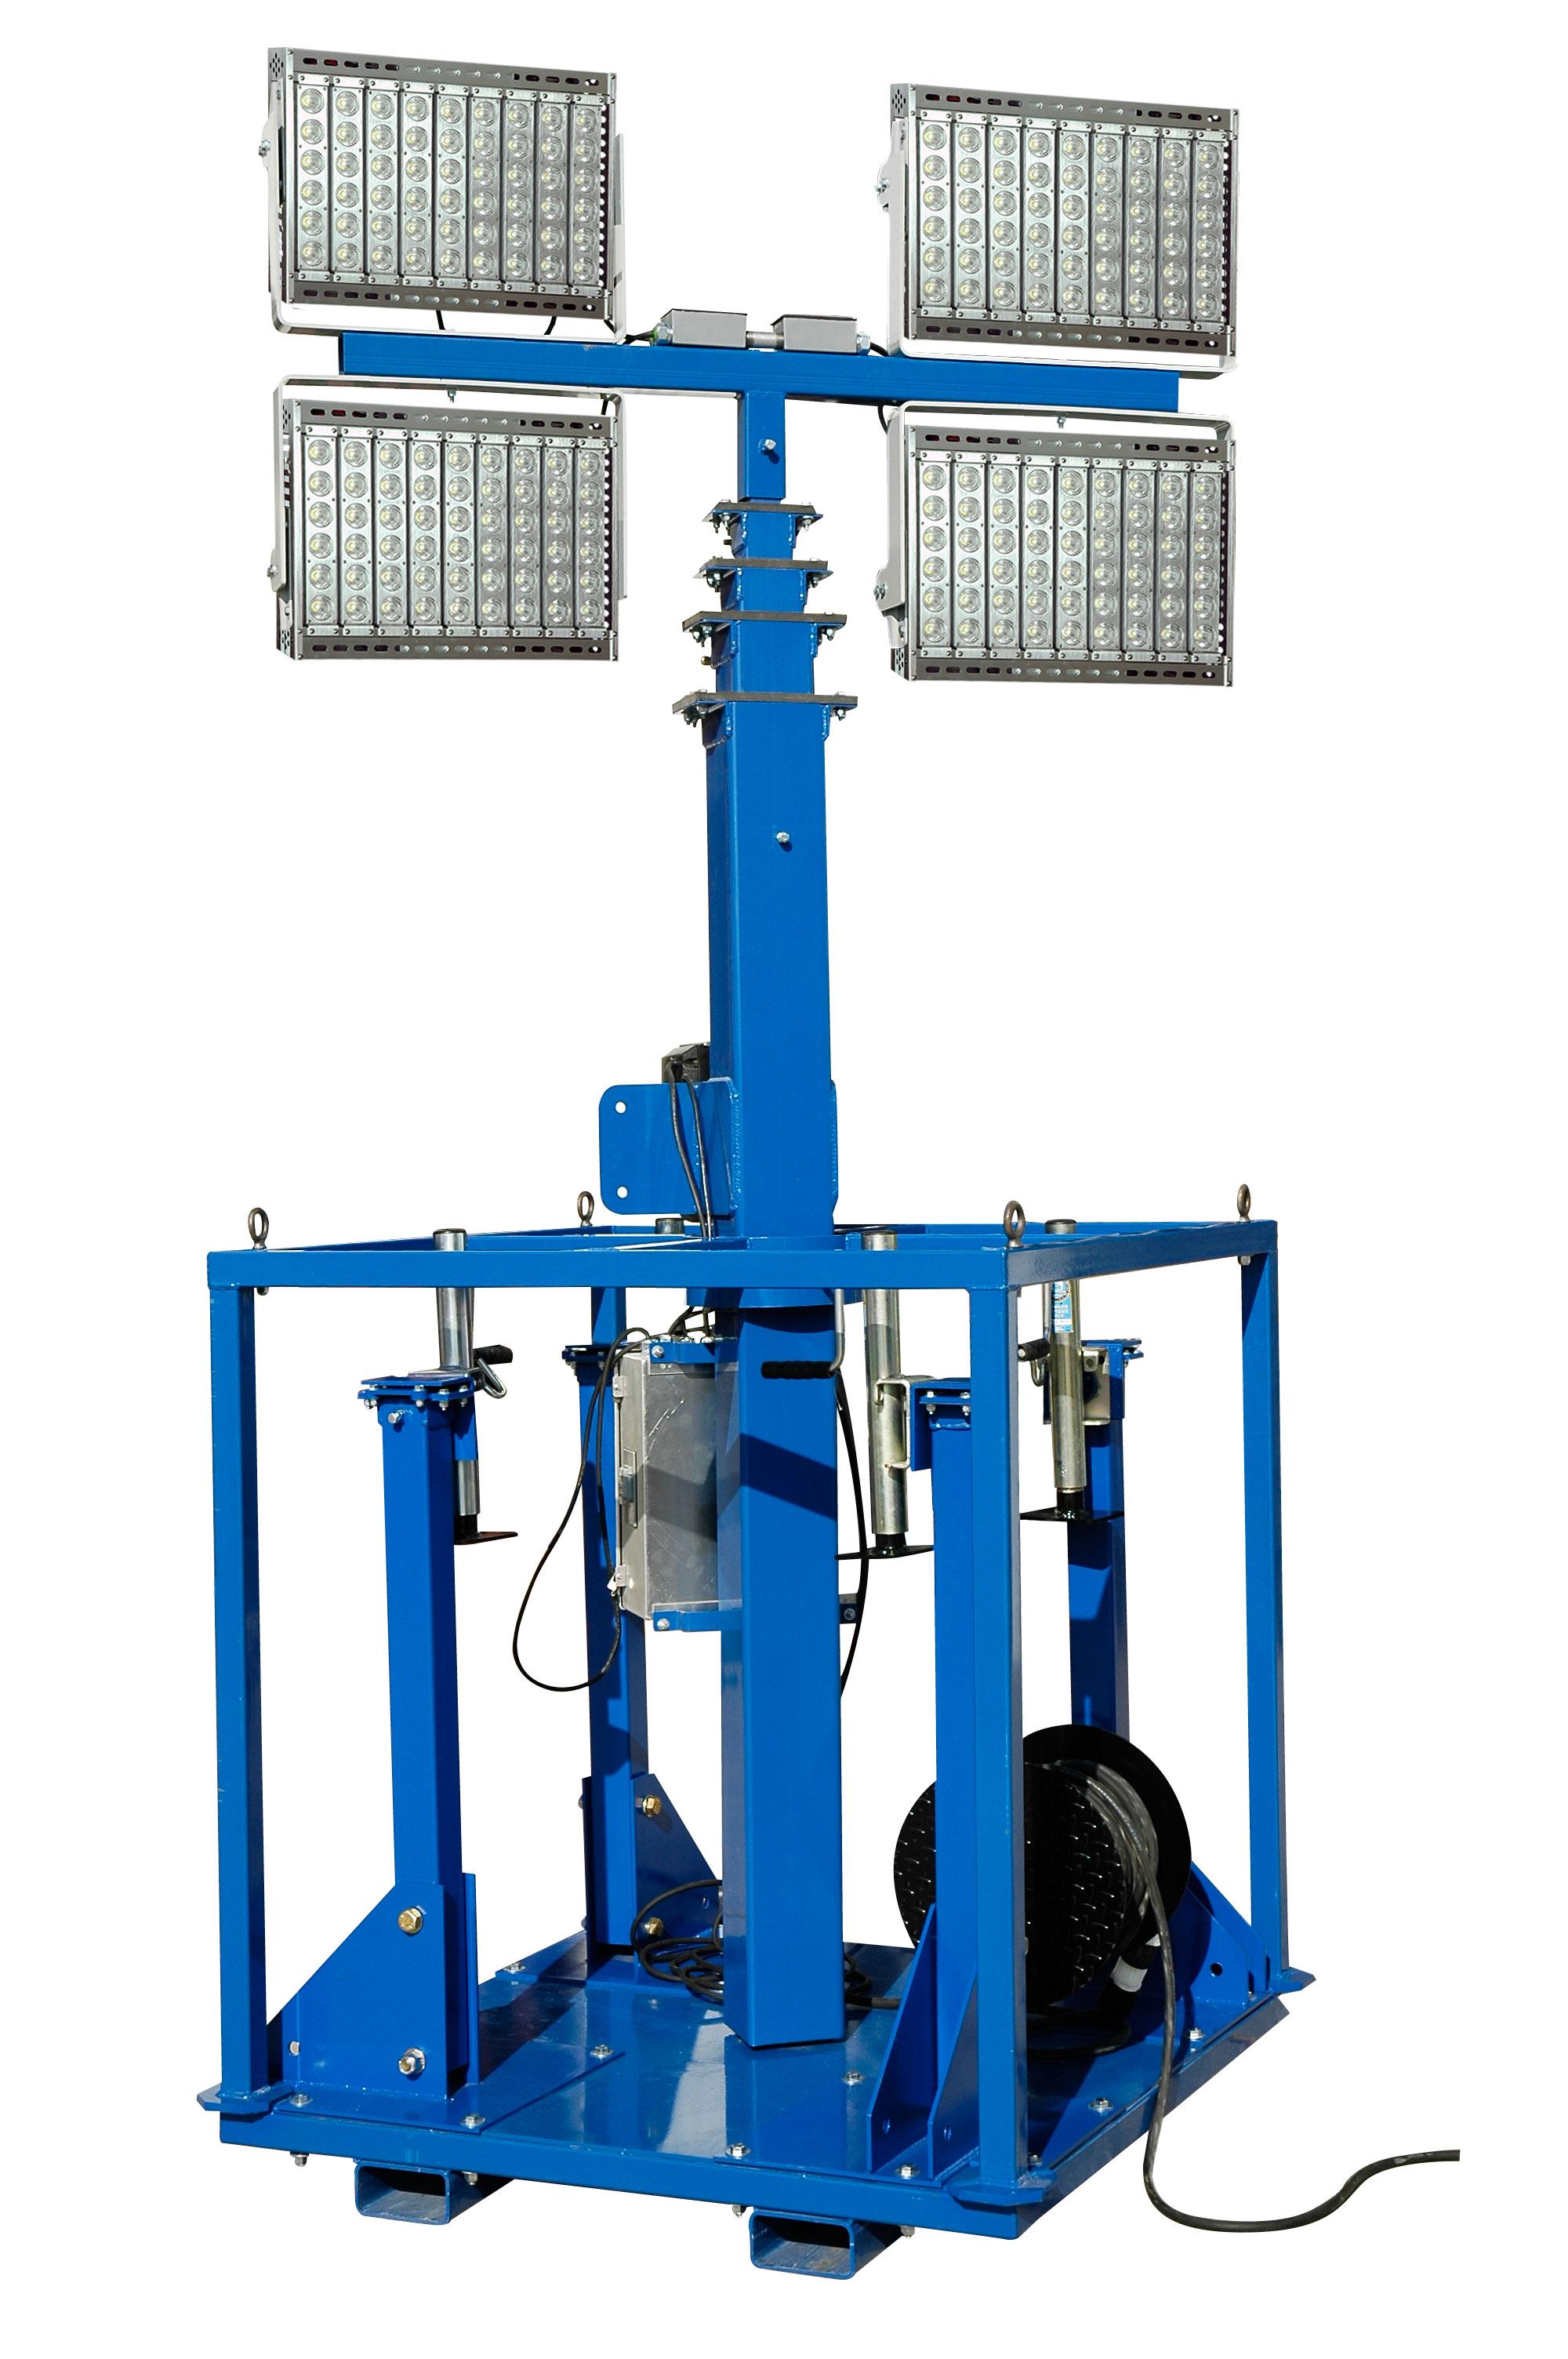 1600 Watt Led Skid Mount Light Mast With Electric Winch